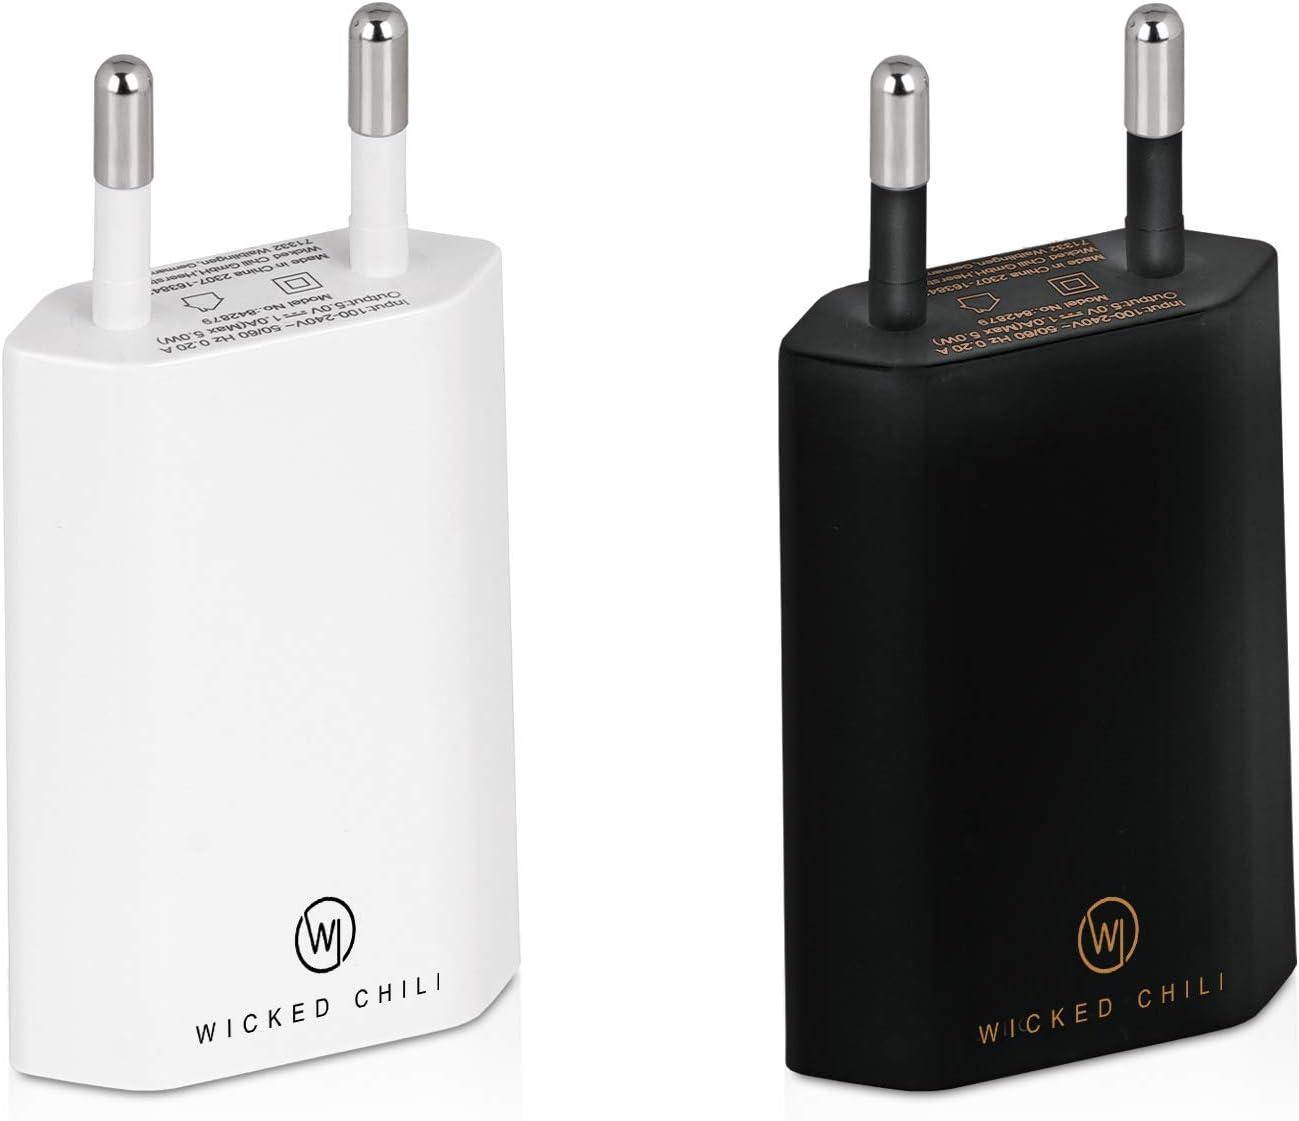 Wicked Chili 2x Pro Series Netzteil Usb Adapter Kompatibel Mit Apple Iphone Samsung Galaxy Handy Ladegerät